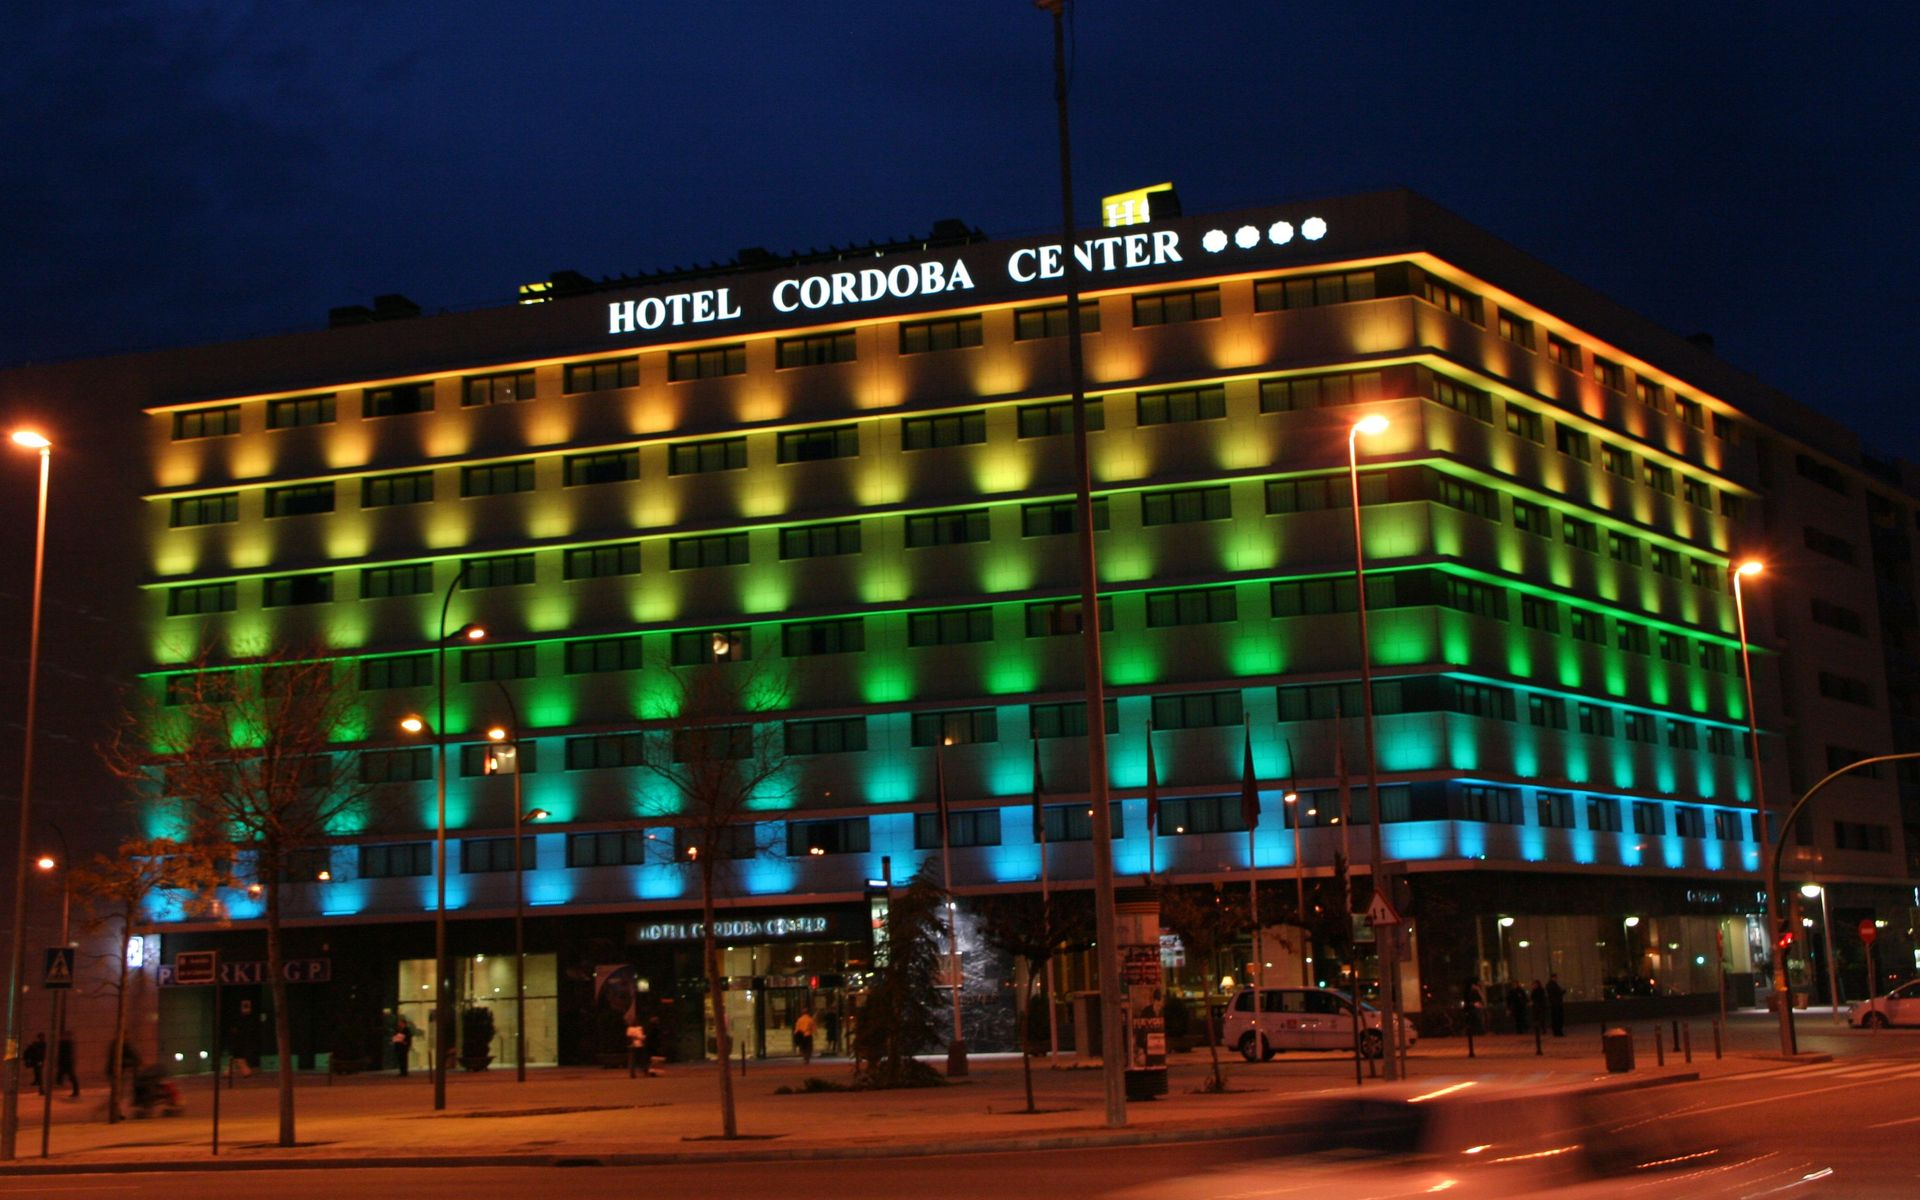 Cordoba Center 4. Córdoba